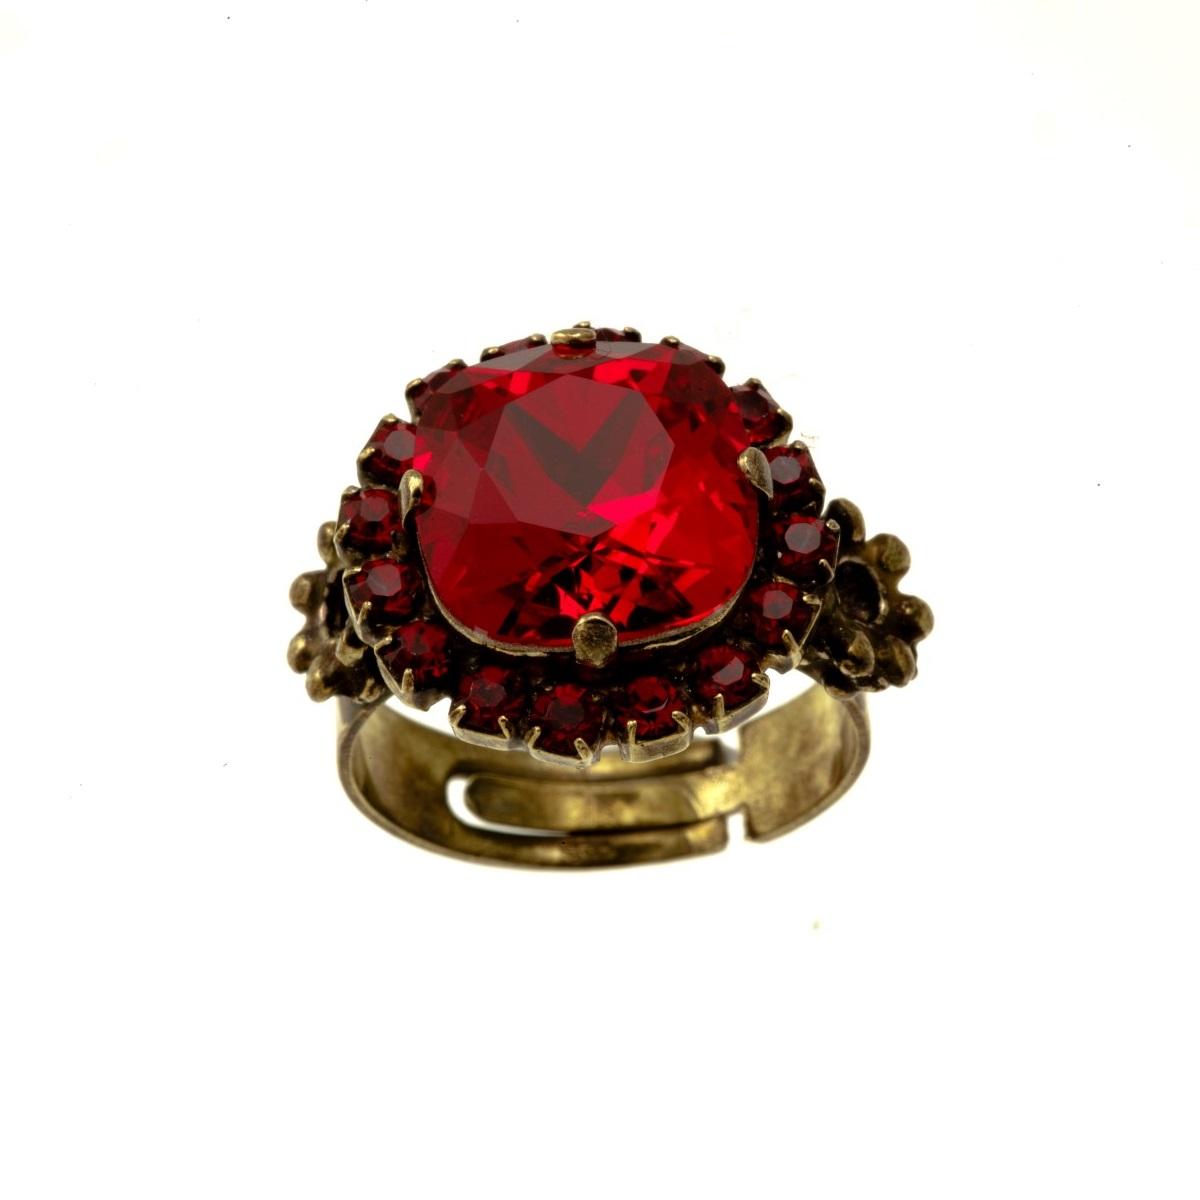 ARTWEAR DIMITRIADIS - Γυναικείο δαχτυλίδι μπρονζέ ARTWEAR DIMITRIADIS με στρας κ γυναικεία αξεσουάρ κοσμήματα δαχτυλίδια